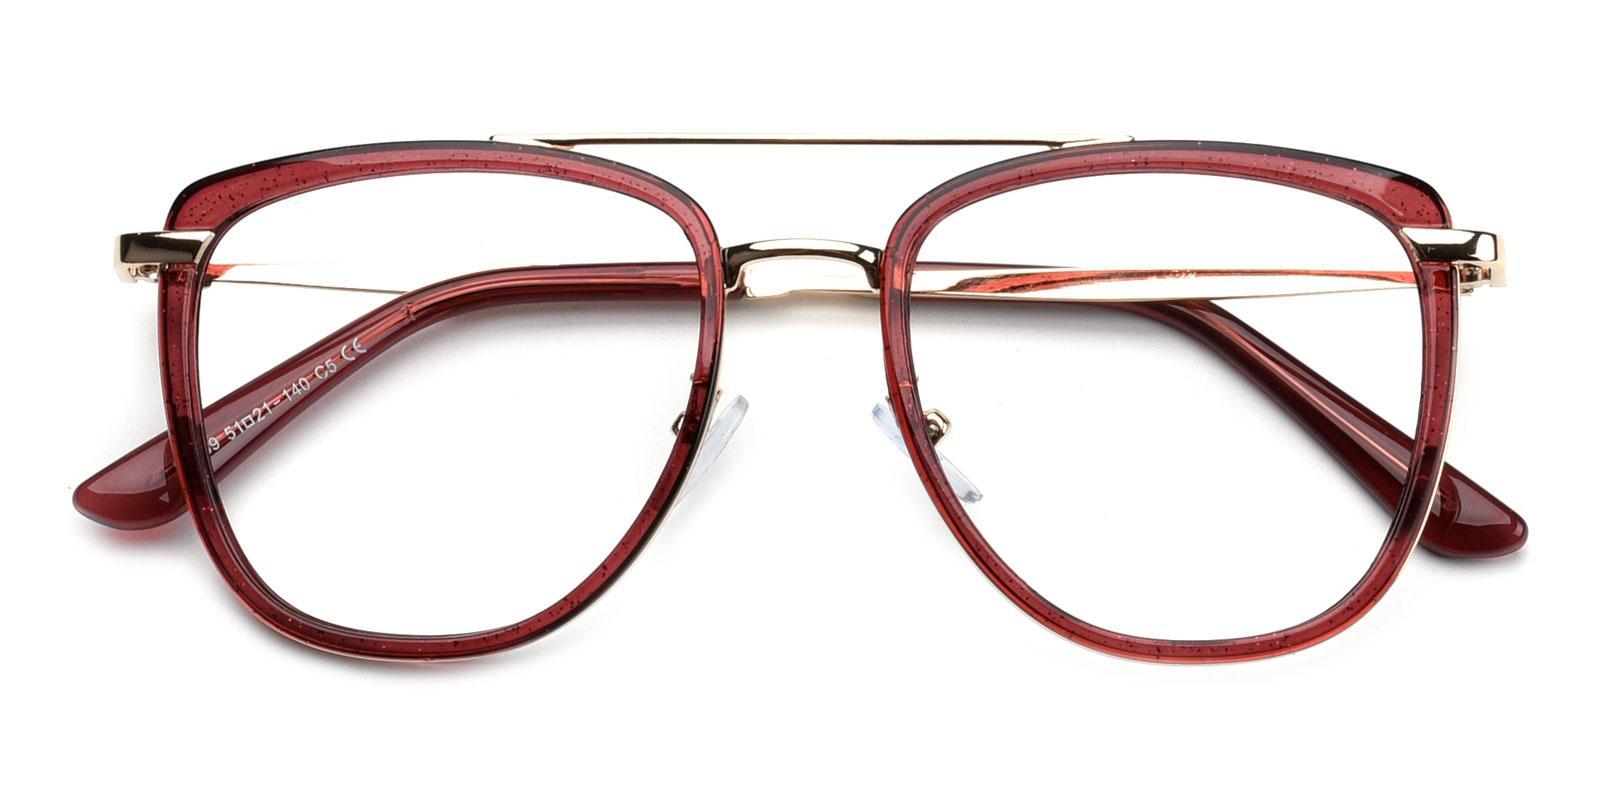 Bid-Purple-Aviator-Combination-Eyeglasses-detail